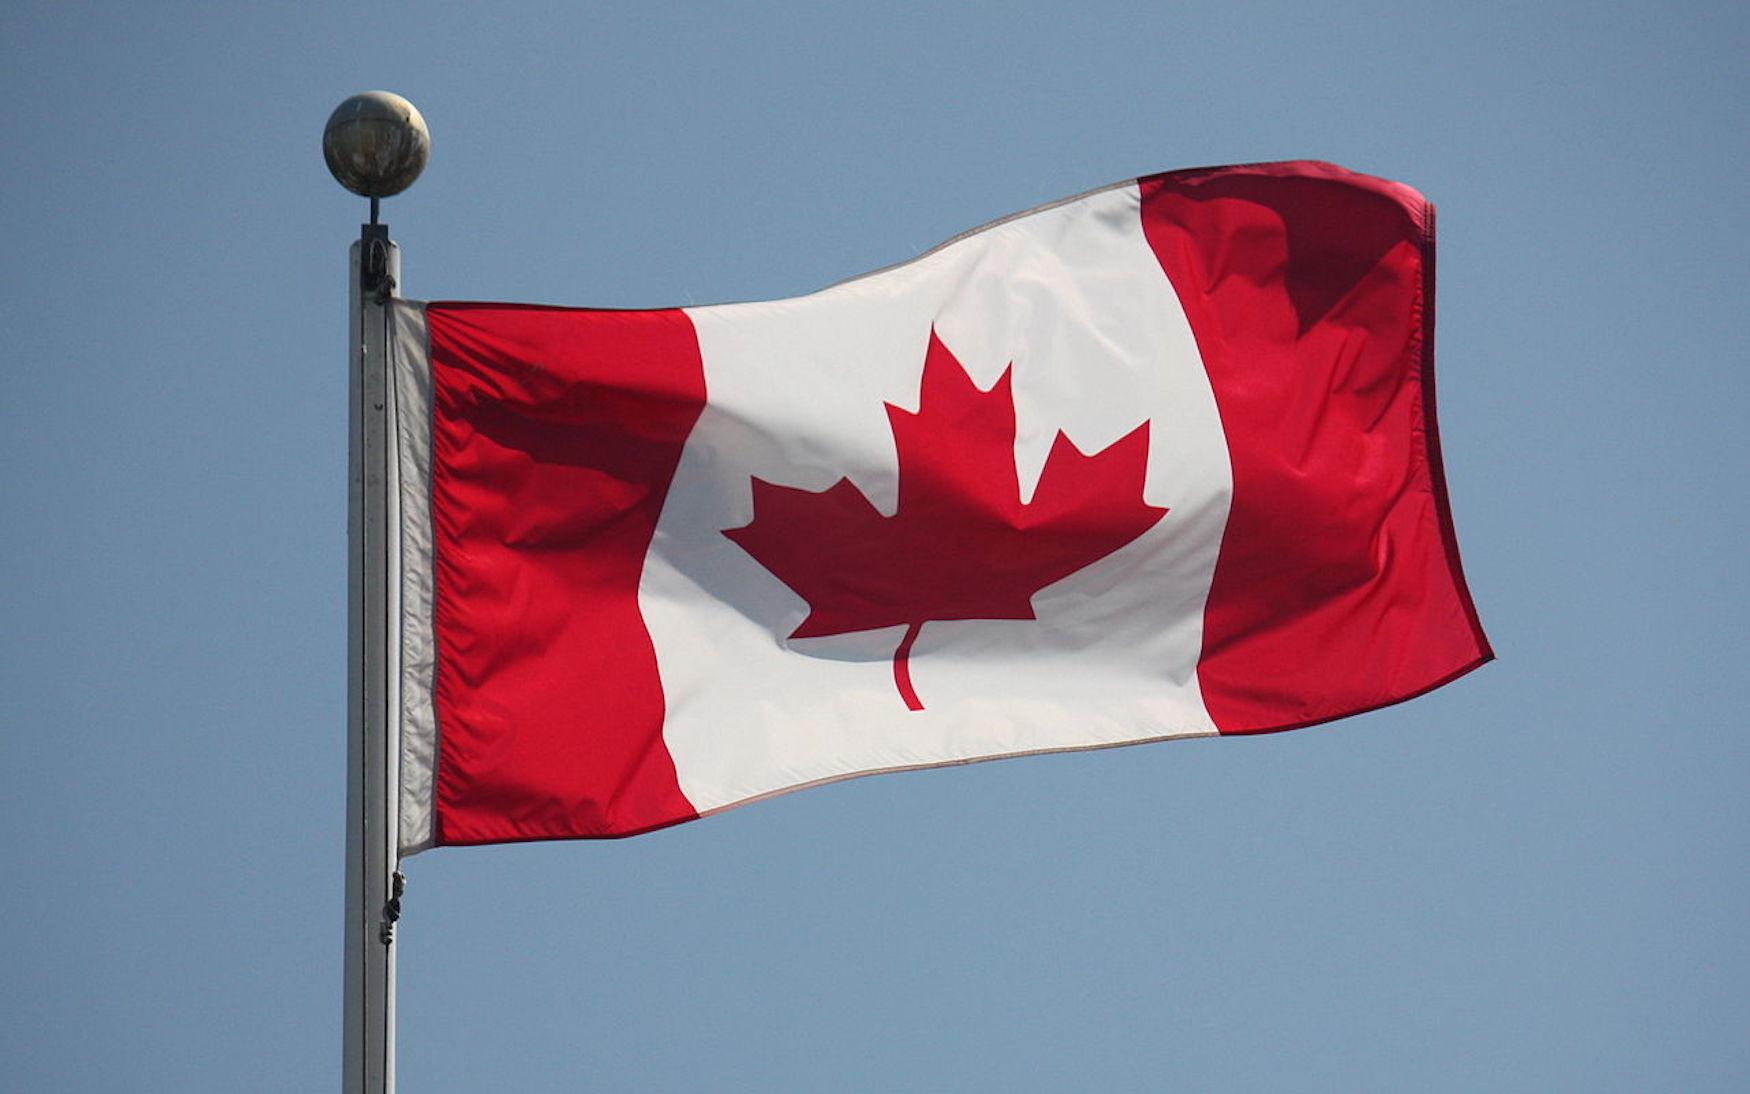 Bandera de Canadá. Wikimedia Commons